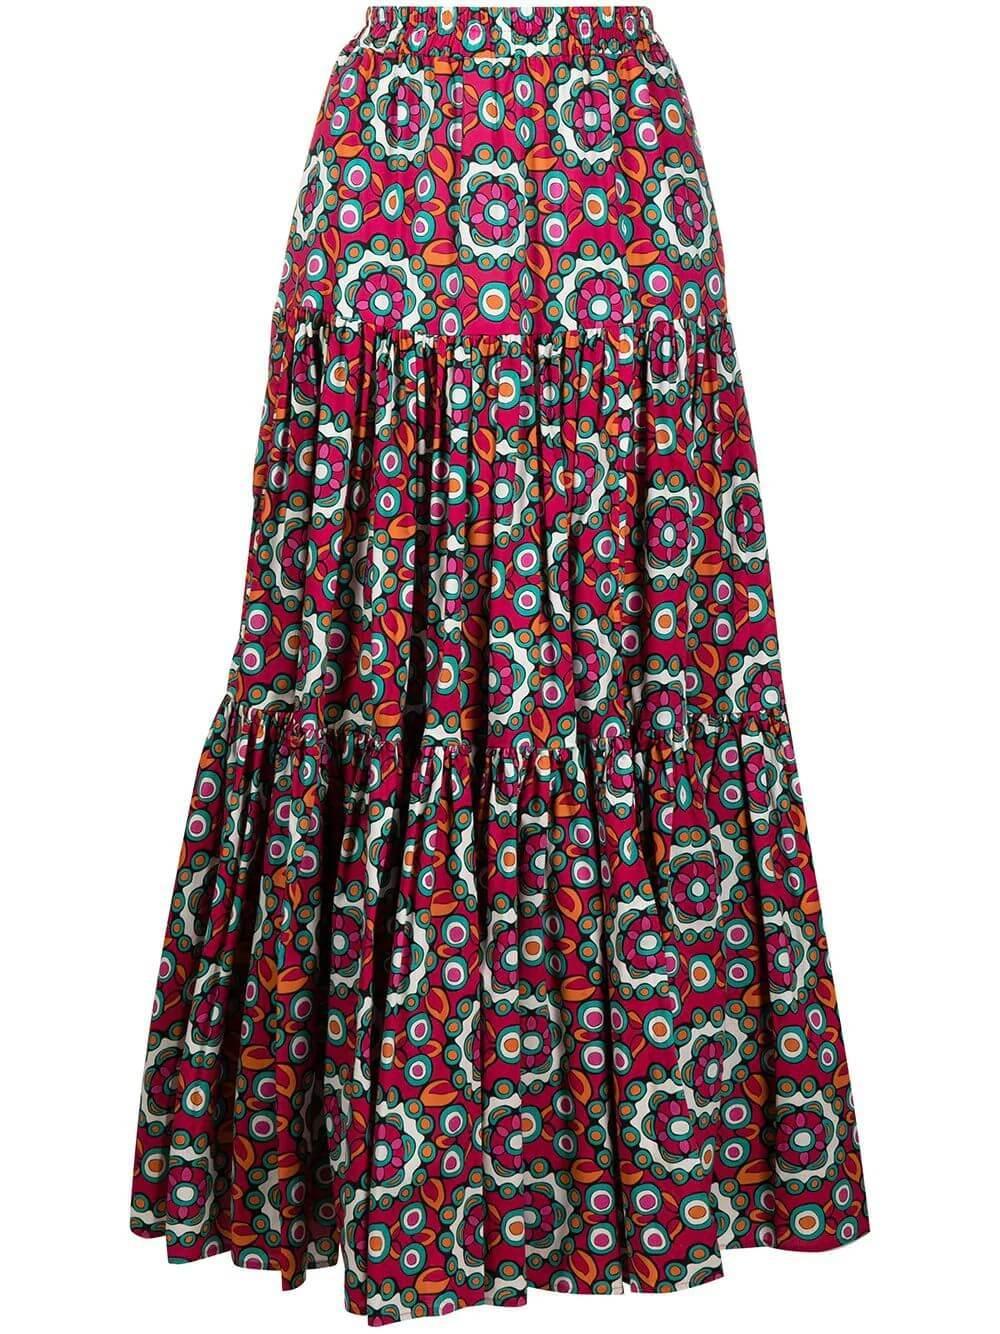 Big Maxi Skirt Item # SKI0001-COT020